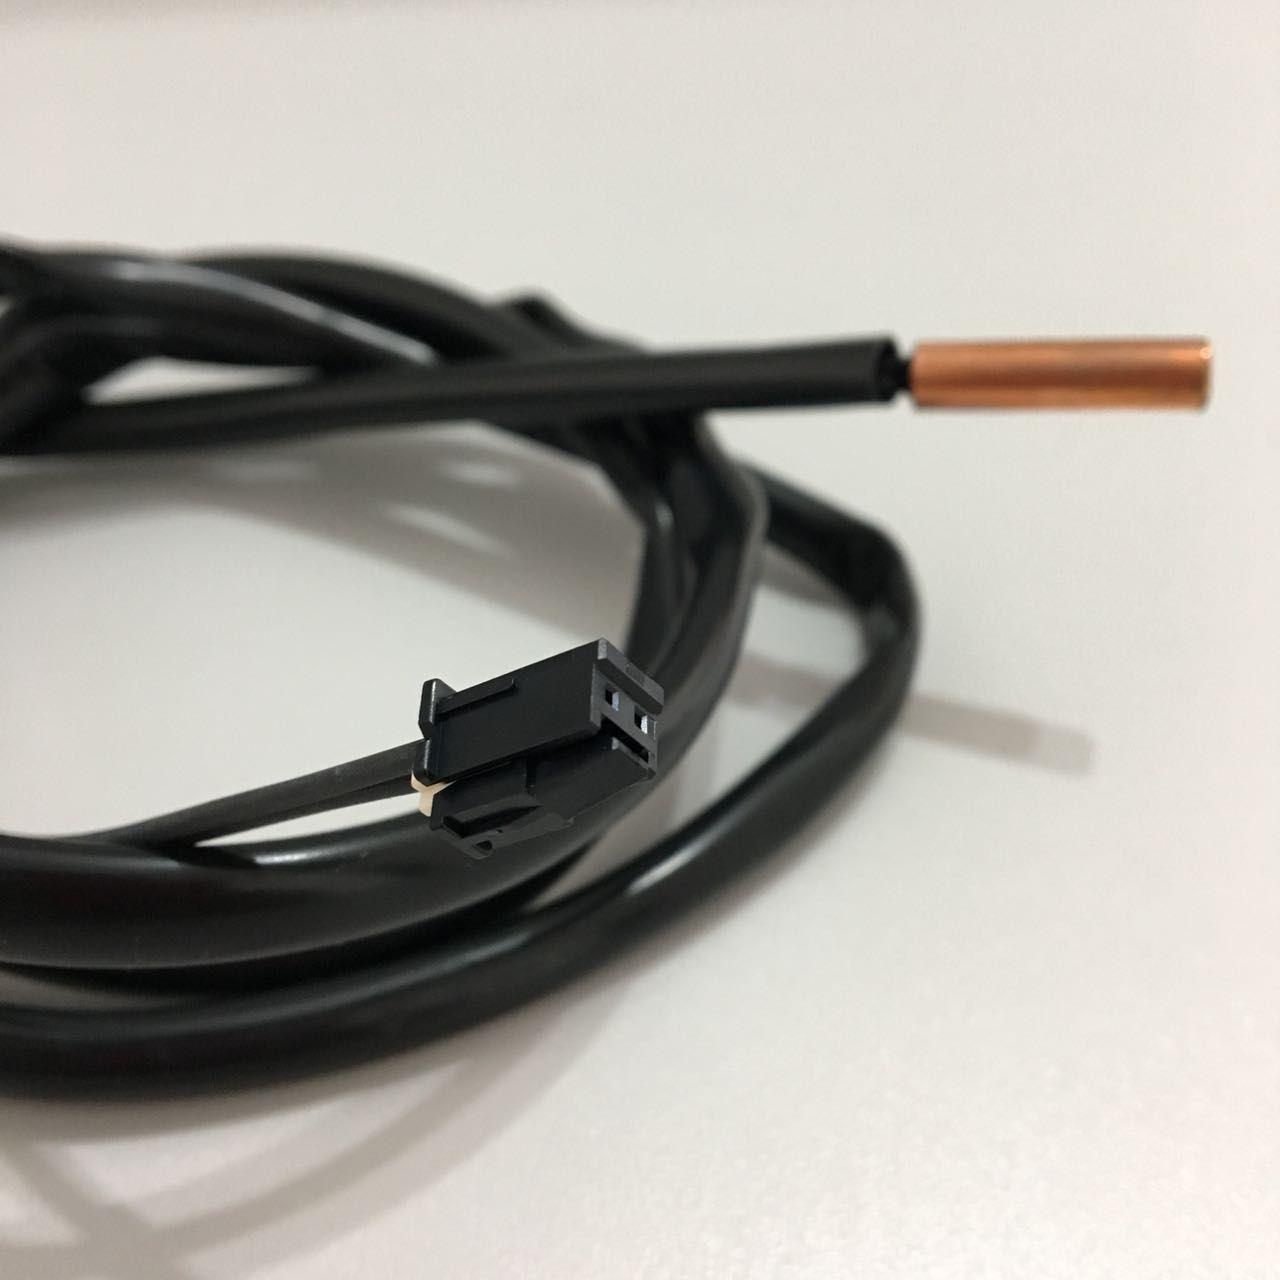 Sensor Coil Condensadora Hitachi Modelos RPI 0,8 a 6,0, RCI 1,0 a 5,0, RCIM 1,0 a 2,0, RPC 2,5 a 6,0